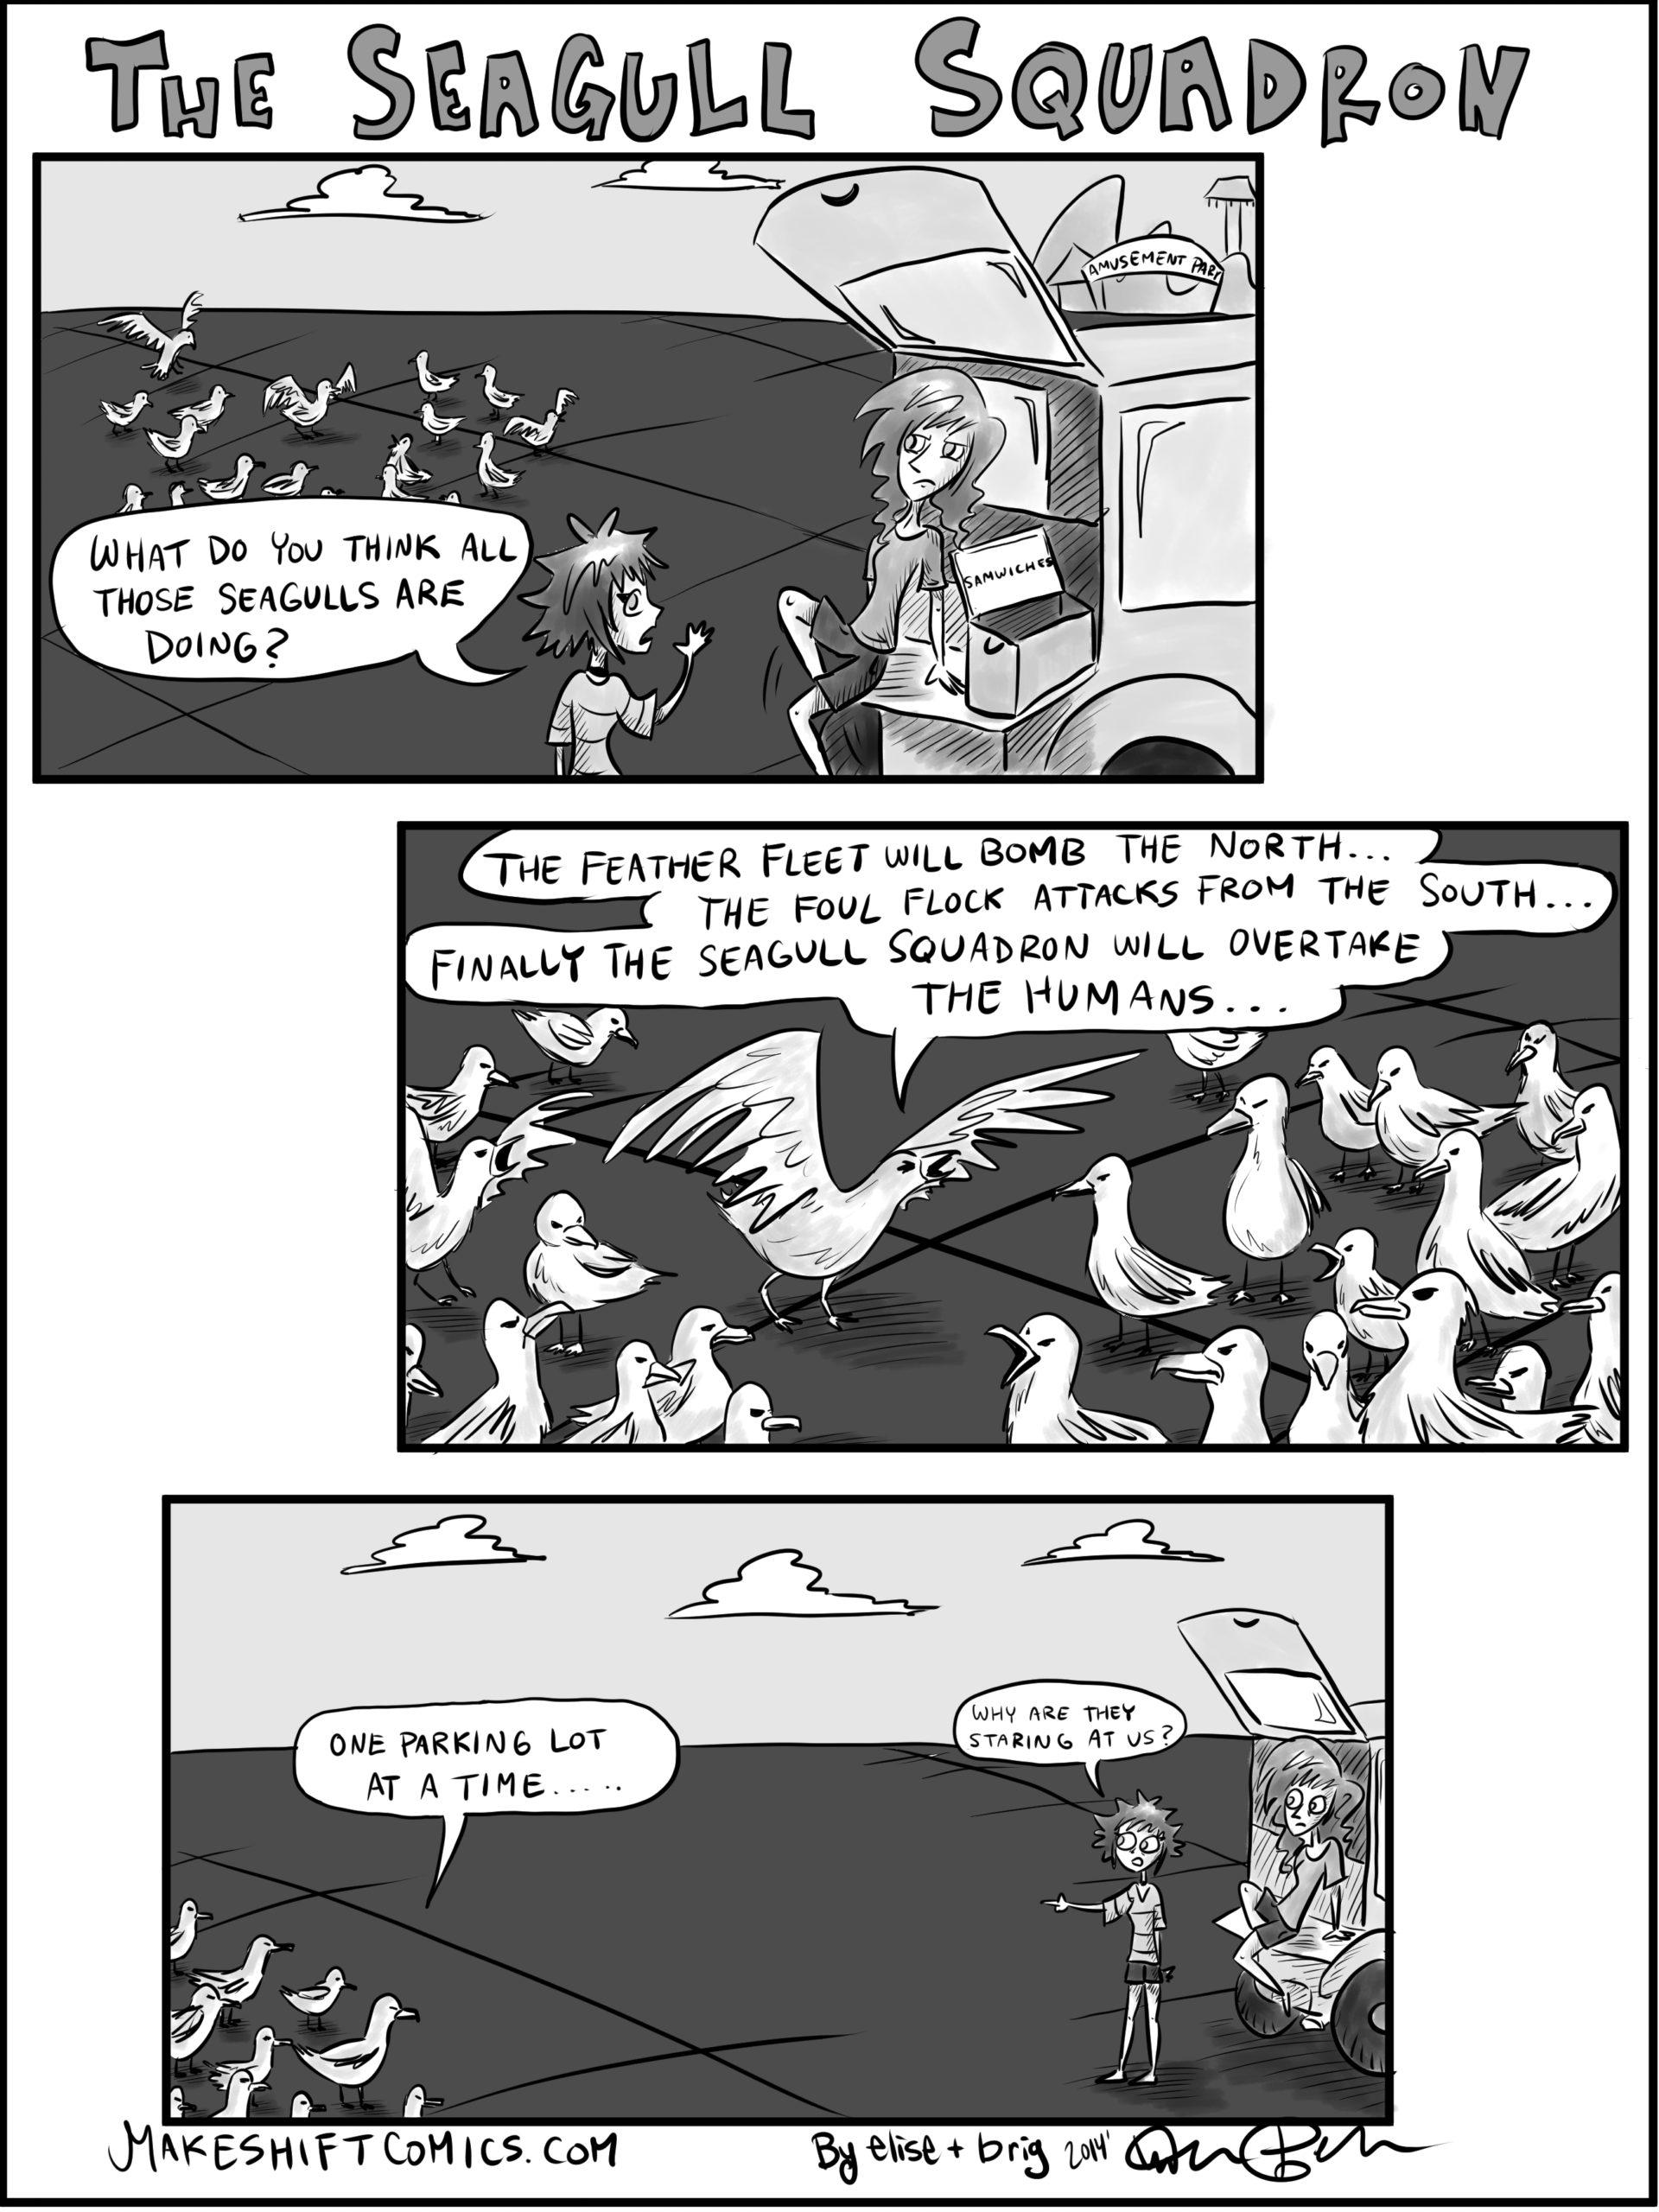 The Seagull Squadron